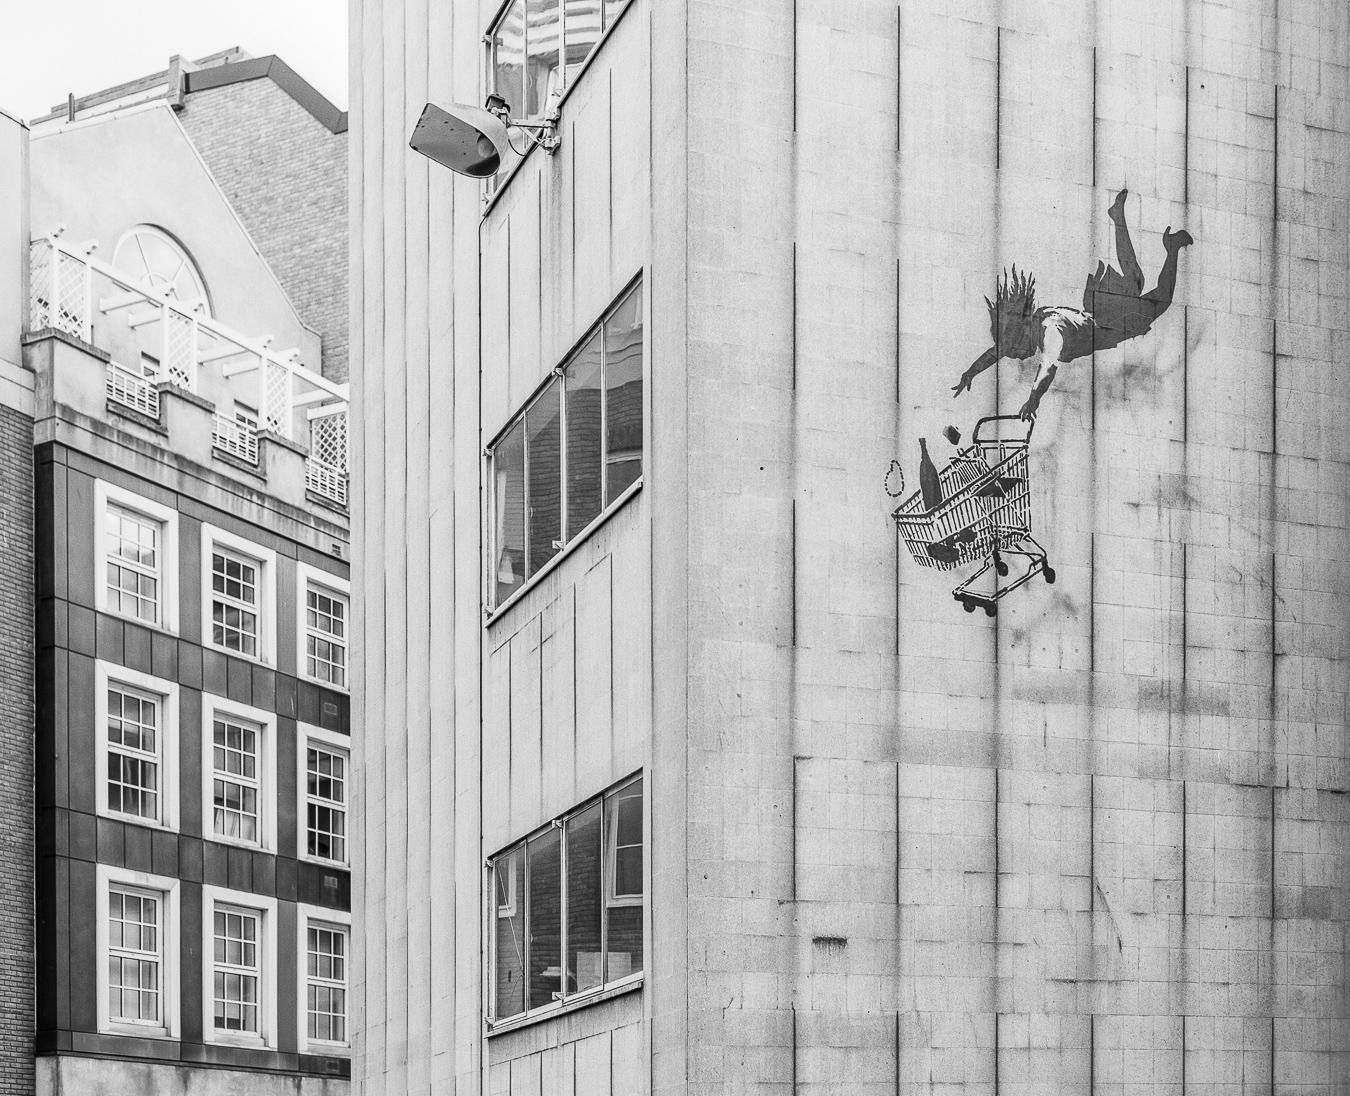 Banksy's 'Shop Until You Drop', Bruton Street, London - ARTVISIT